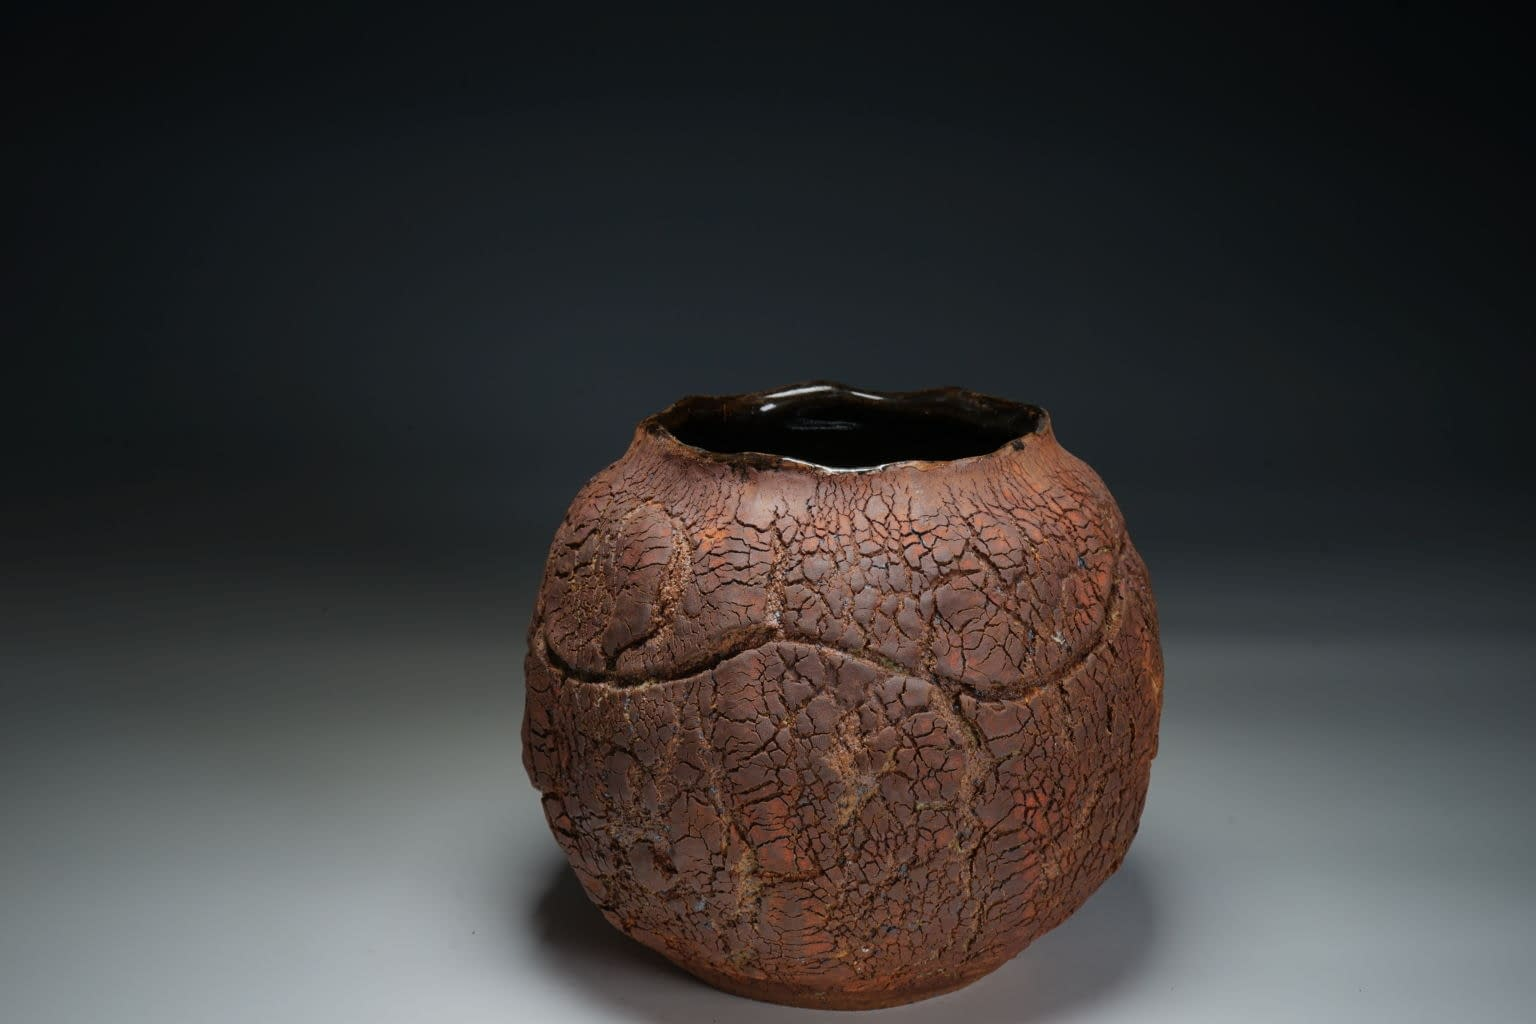 Rich dark moon vase form with heavy earth texture.